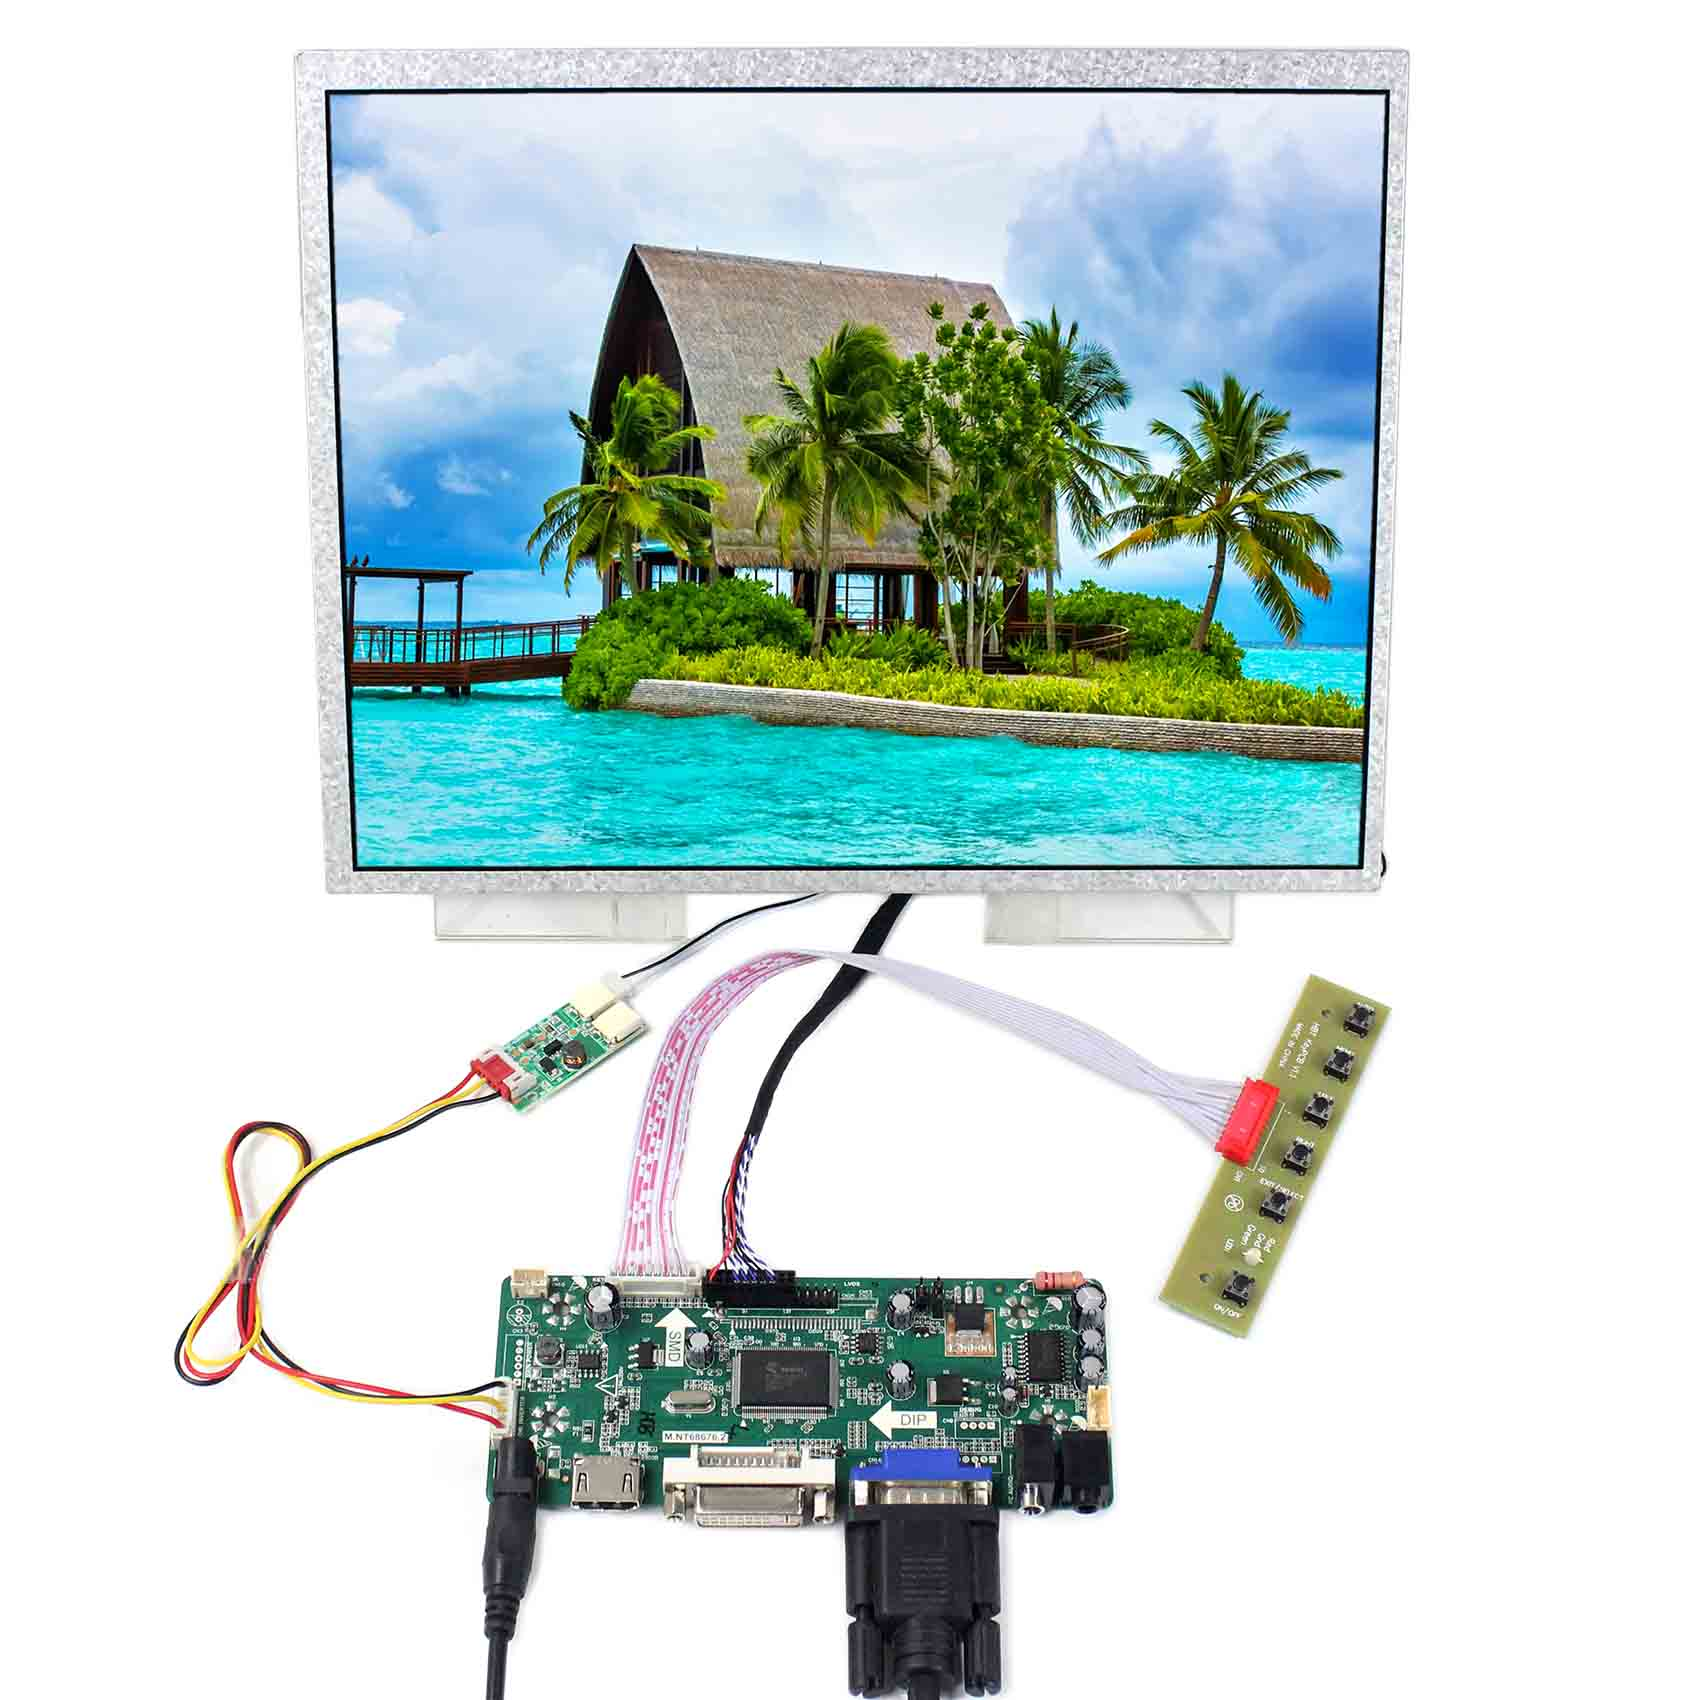 HDMI DVI VGA AUDIO LCD Board Work for LVDS Interface LCD Screen 12.1  1024X768 LCD Screen VS121T-001AHDMI DVI VGA AUDIO LCD Board Work for LVDS Interface LCD Screen 12.1  1024X768 LCD Screen VS121T-001A